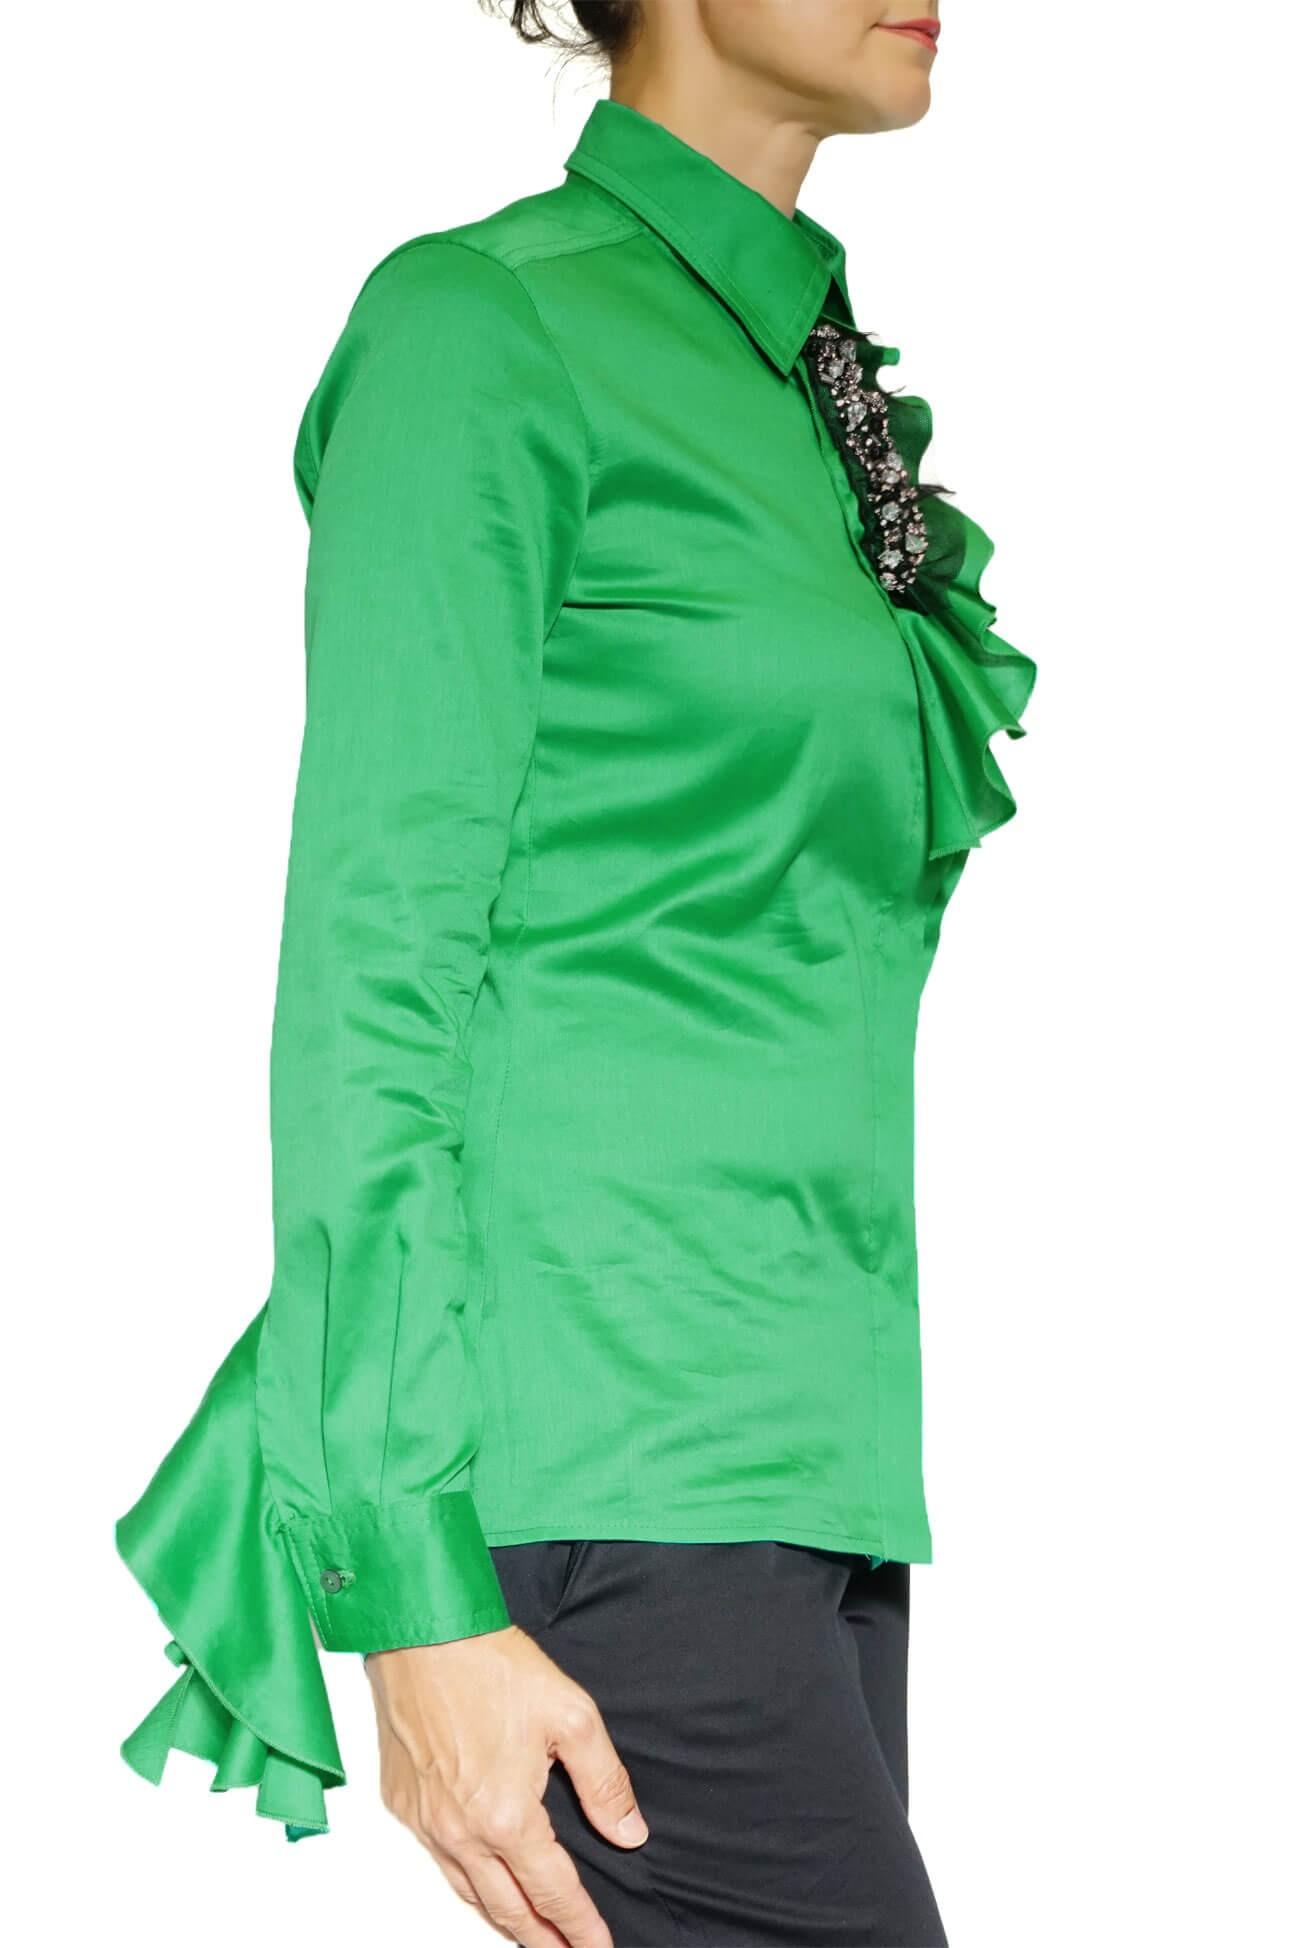 camasa verde cu volane si aplicatii cu pietre(  produs la precomanda  )